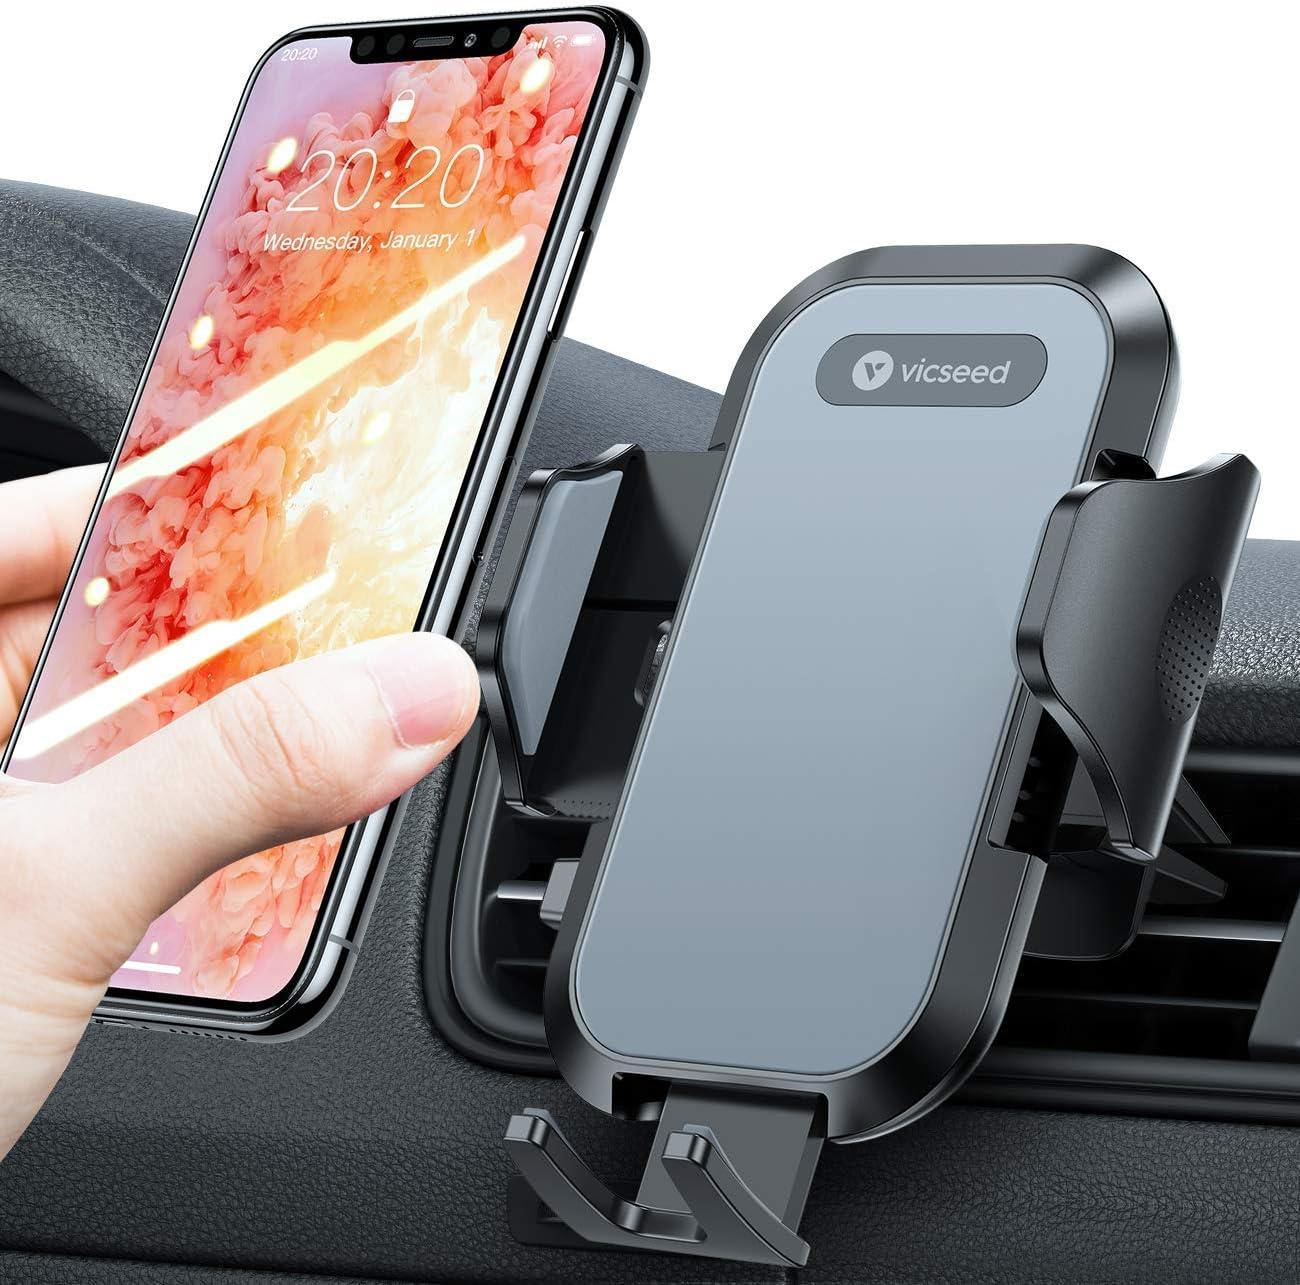 Vicseed Handyhalterung Auto Lüftung Universal 360 Grad Drehung Kfz Autohalterung Für Alle Smartphones Iphone 12 Mini 11 Pro Xs Max Xr X 8 7 6 Plus Samsung S21 S20 S10 S9 S8 S7 Huawei Usw Elektronik